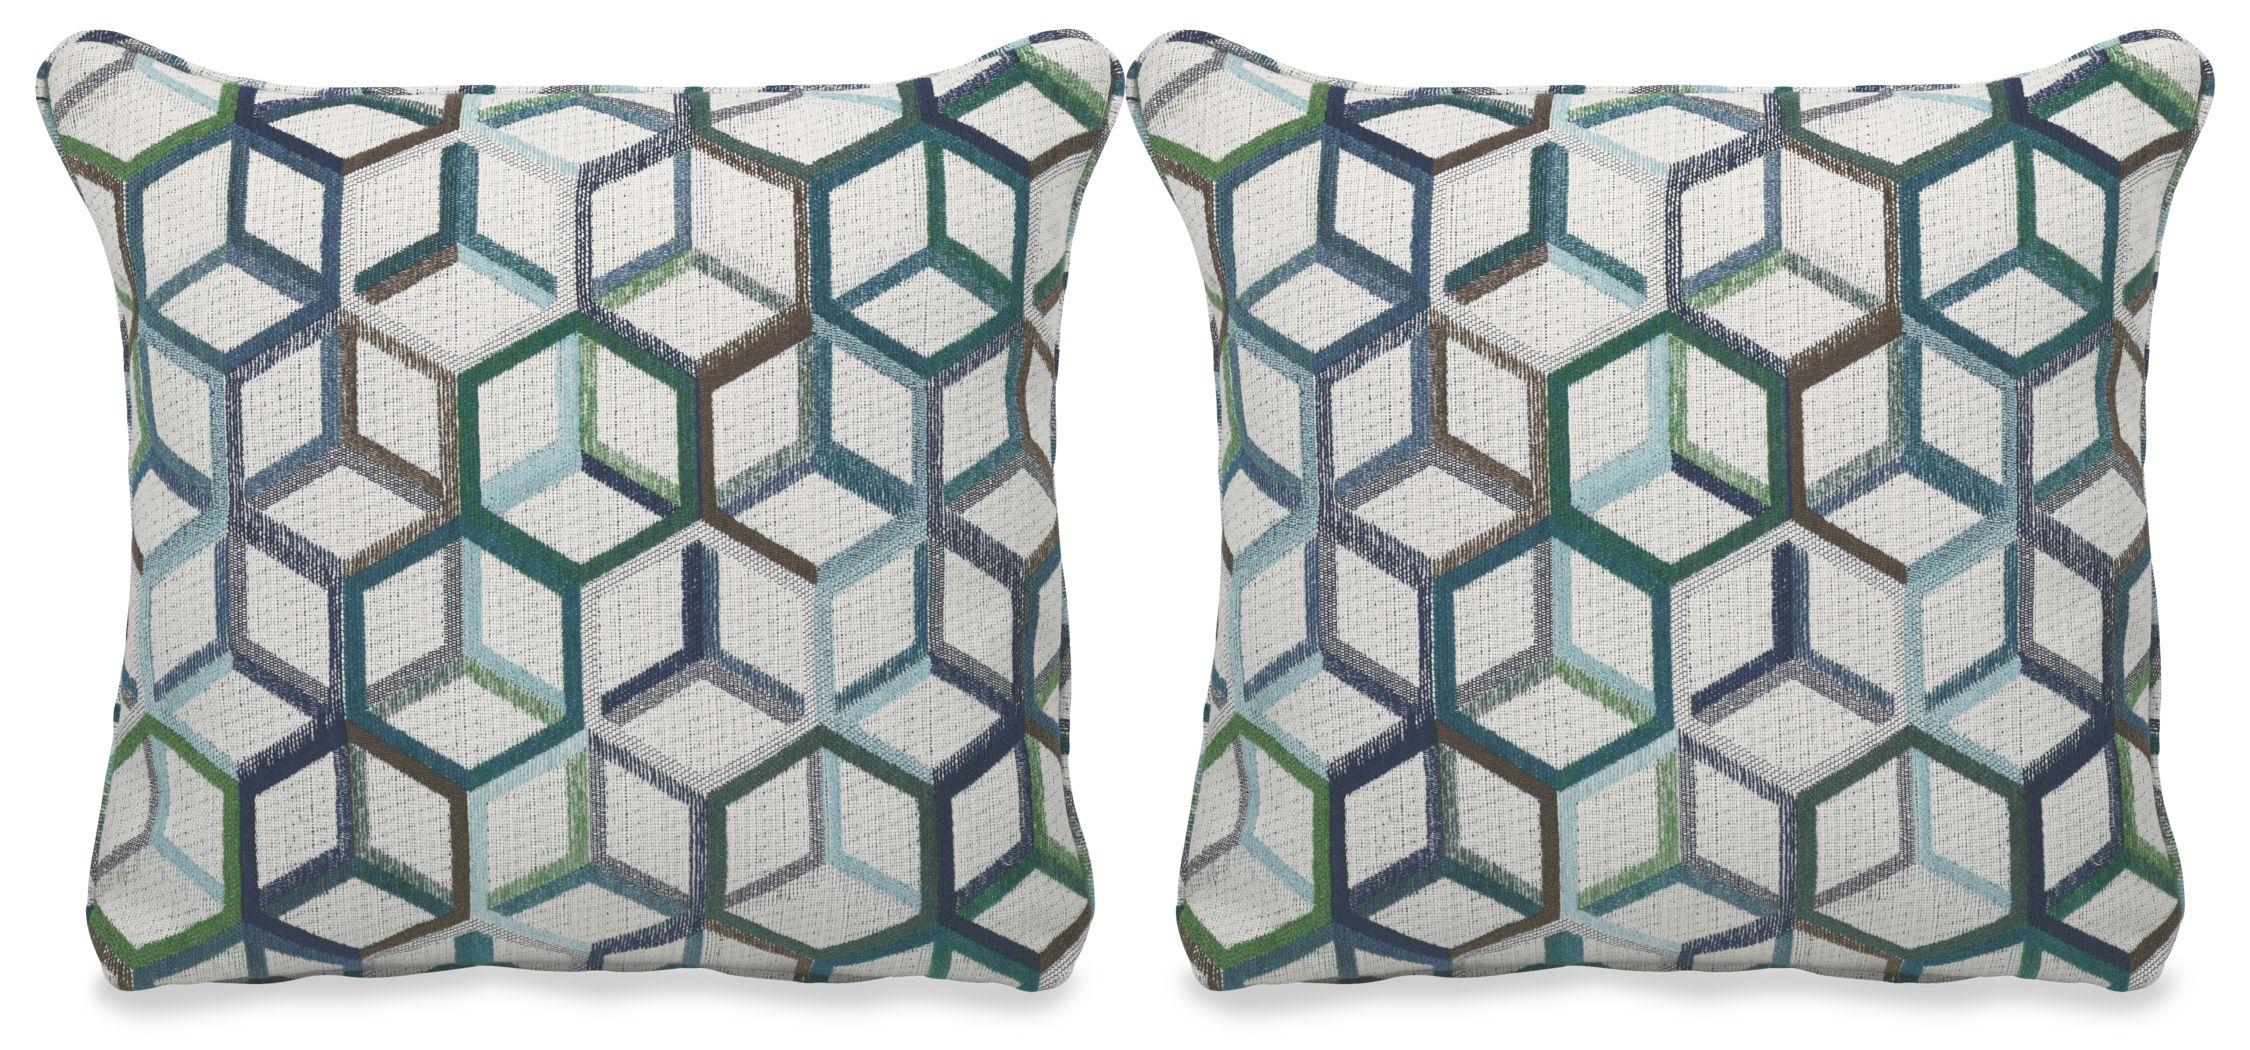 Cubism Emerald Accent Pillow (Set of 2)